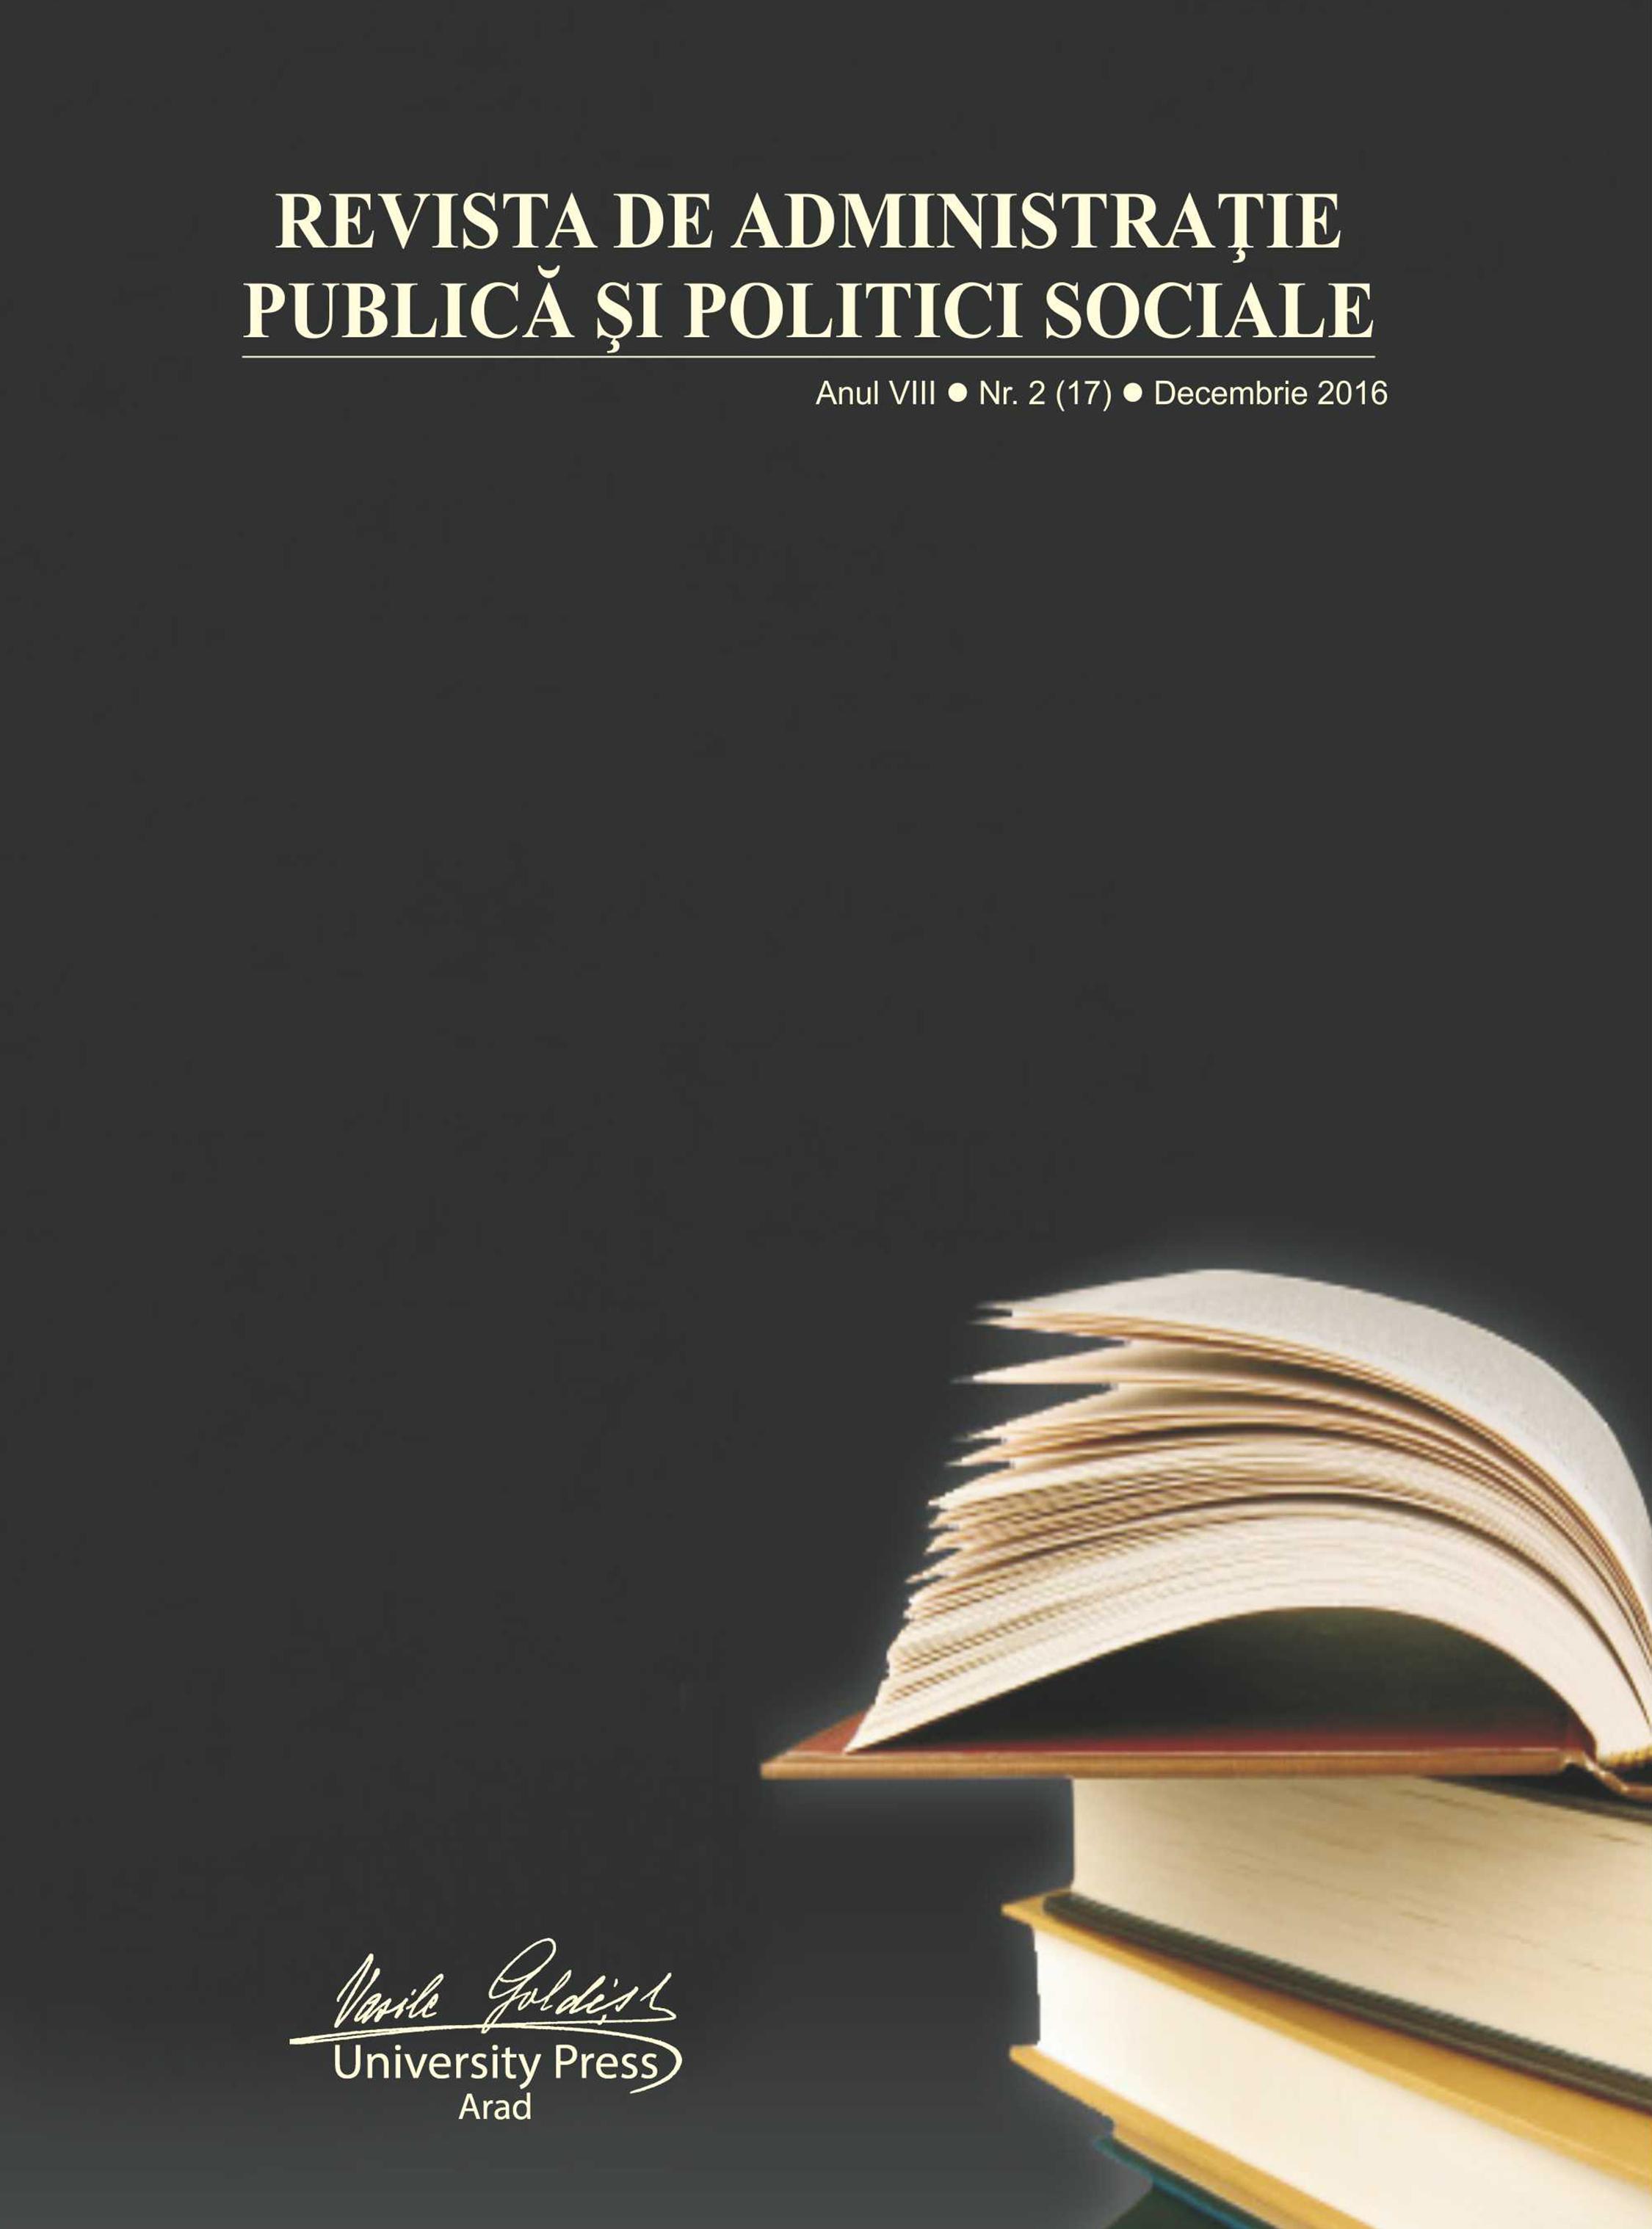 REVISTA-DE-ADMINISTRATIE-PUBLICA-SI-POLITICI-SOCIALE